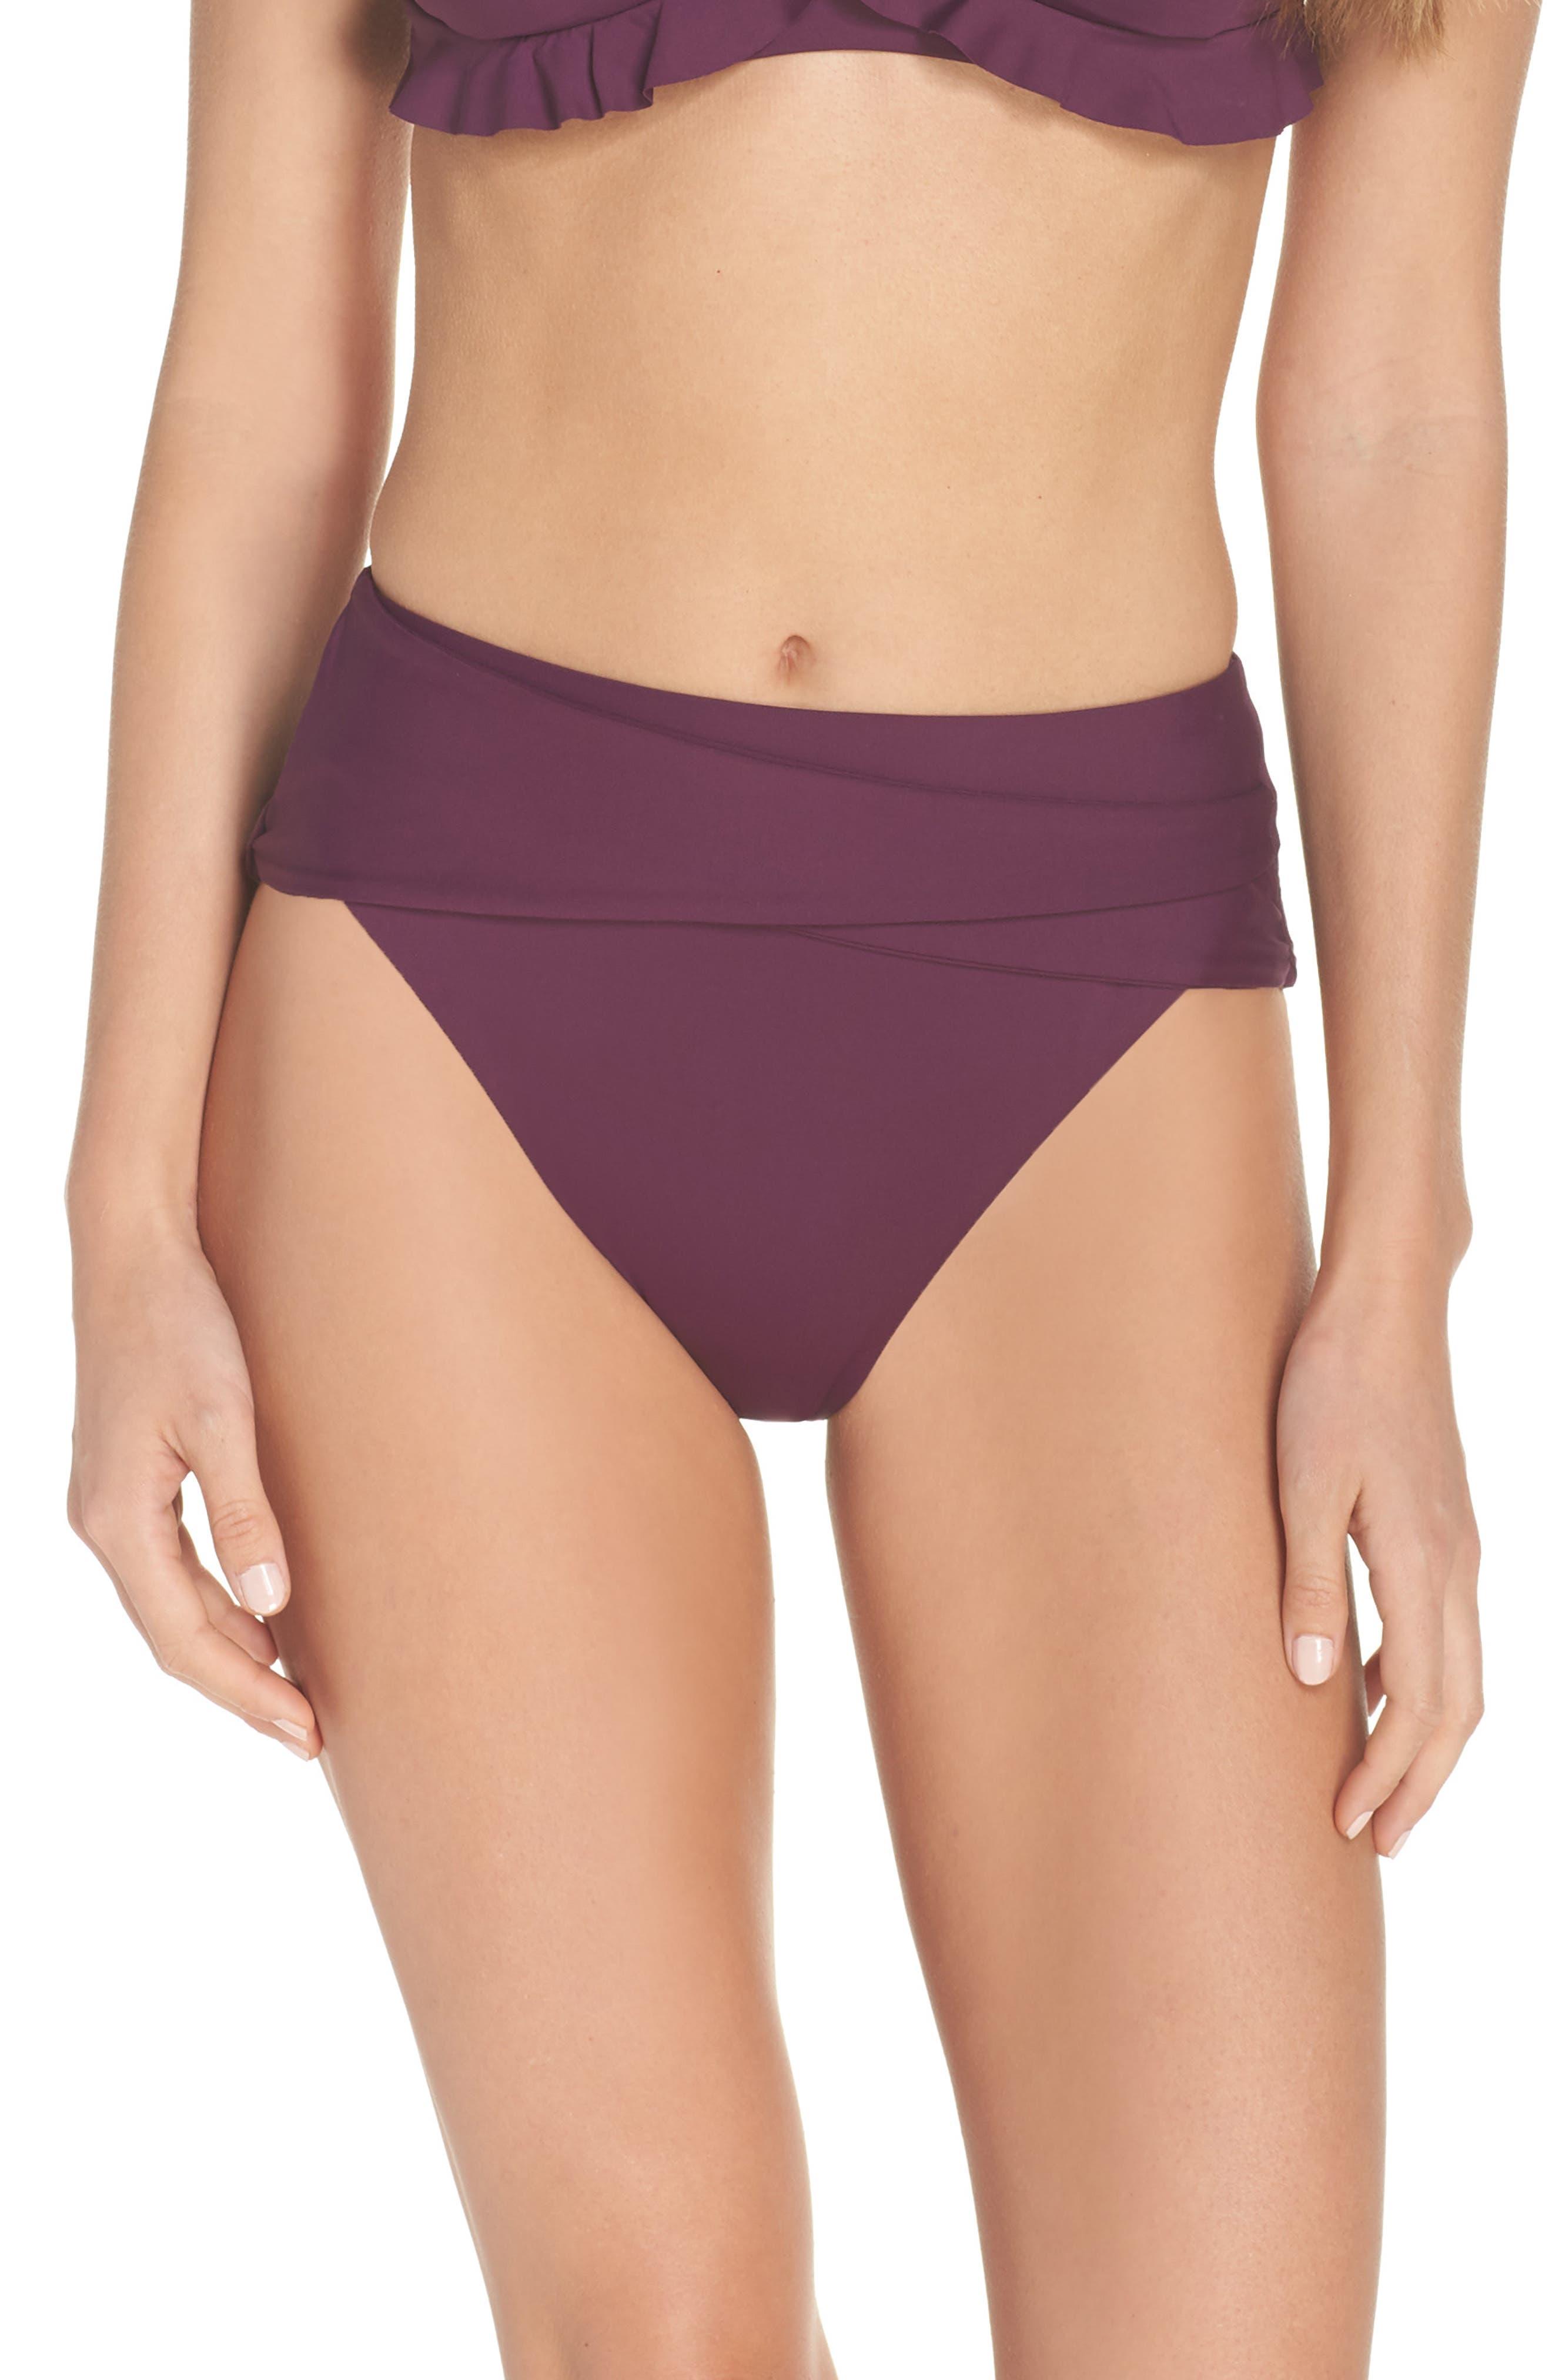 Becca Color Code Crossover High Waist Bikini Bottoms, Burgundy